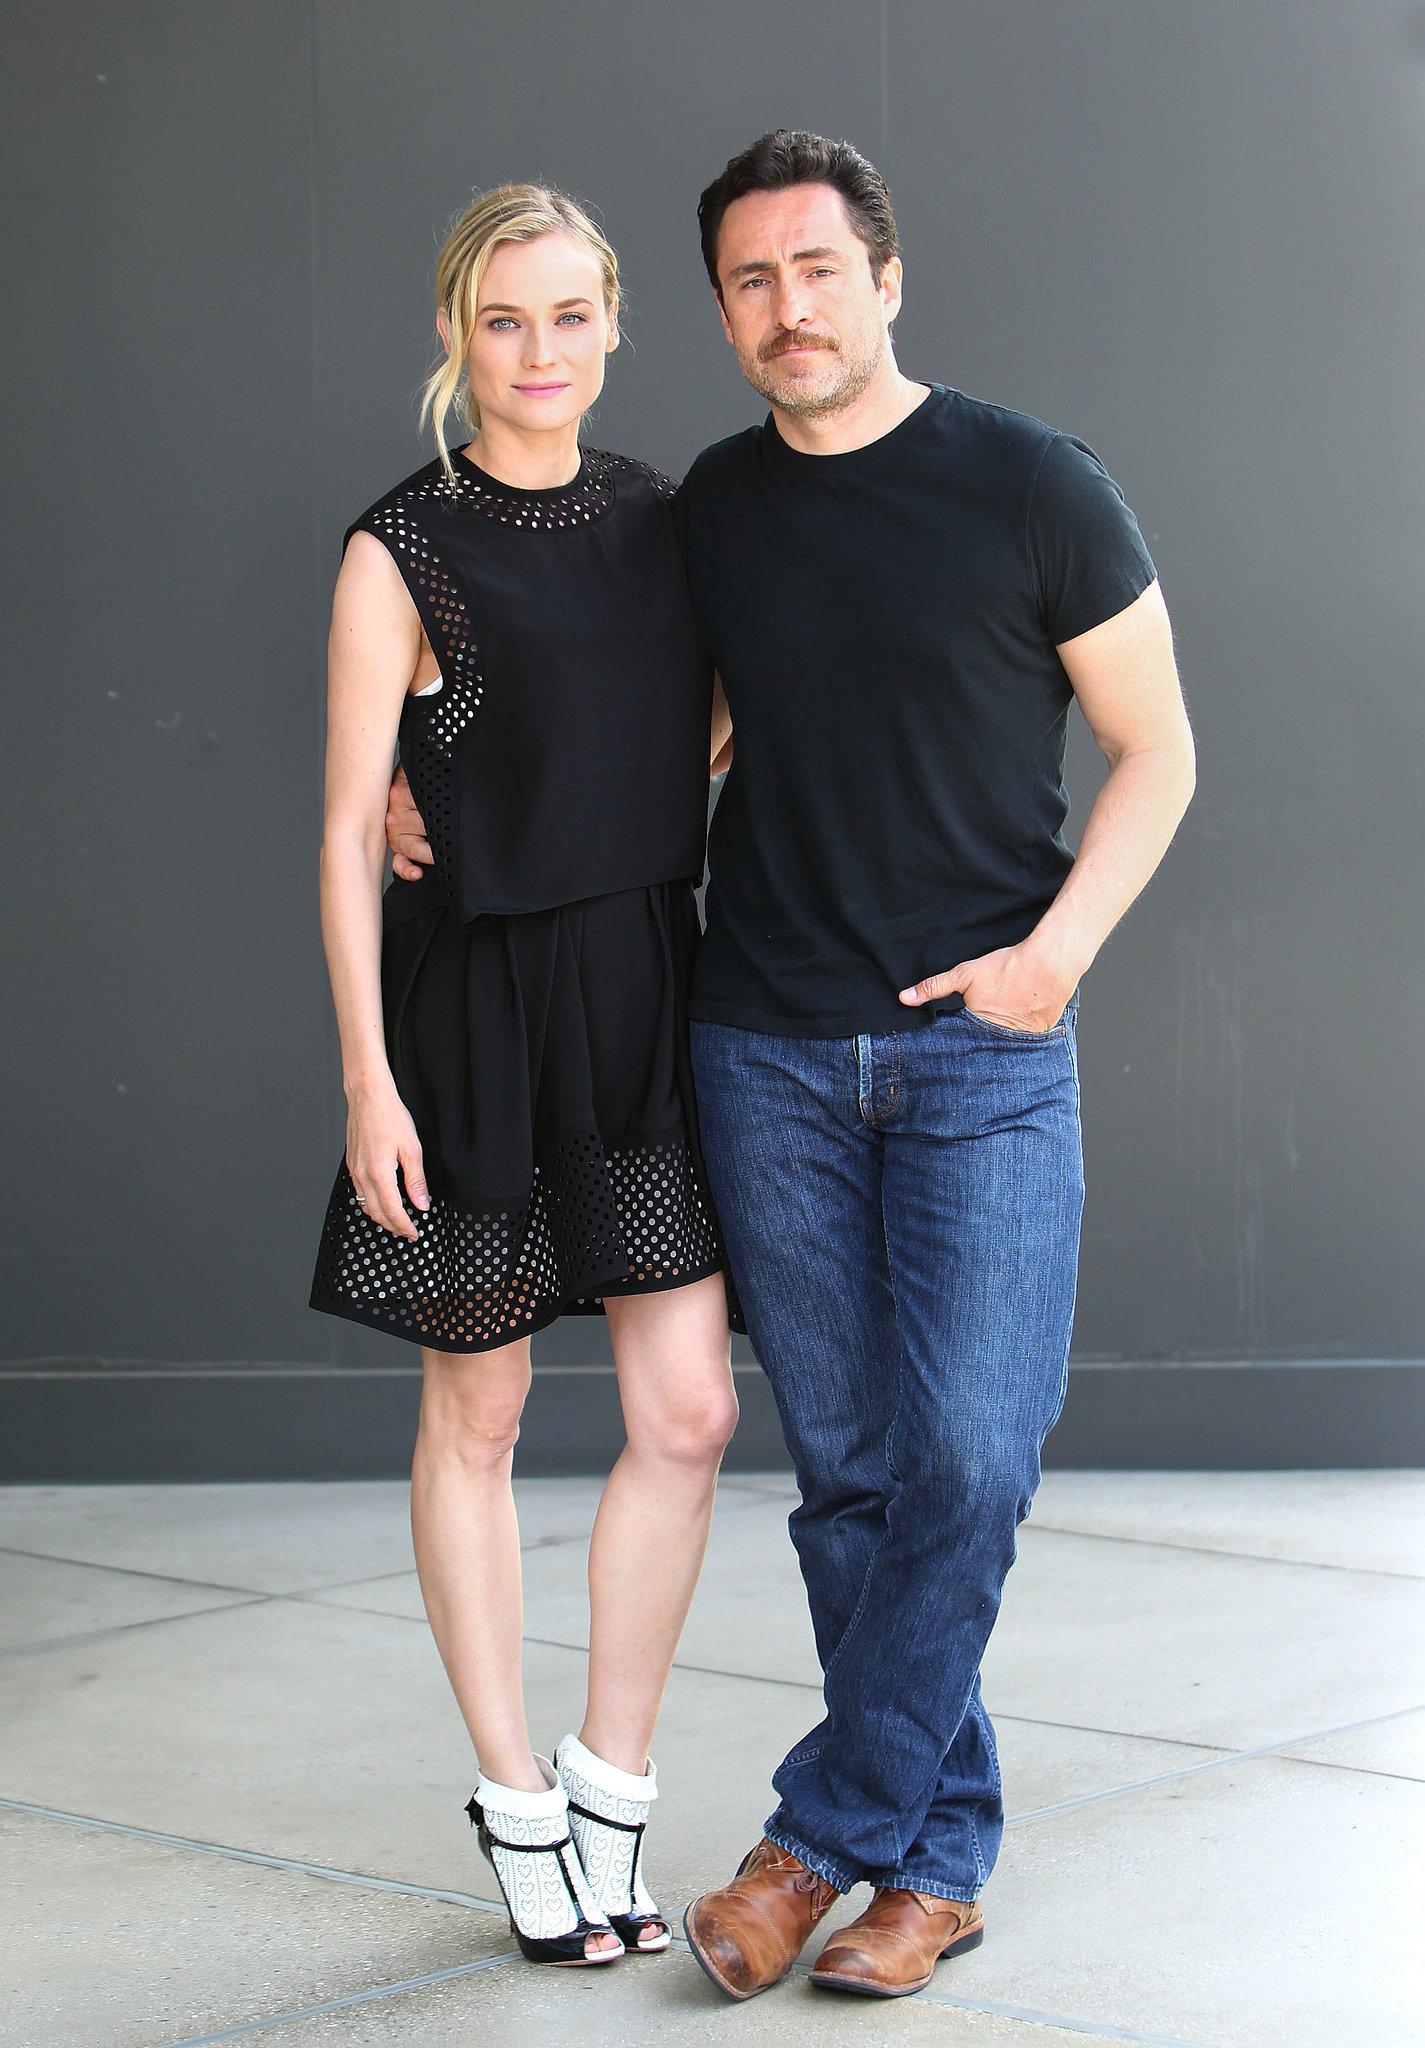 Diane Kruger and Demian Bichir